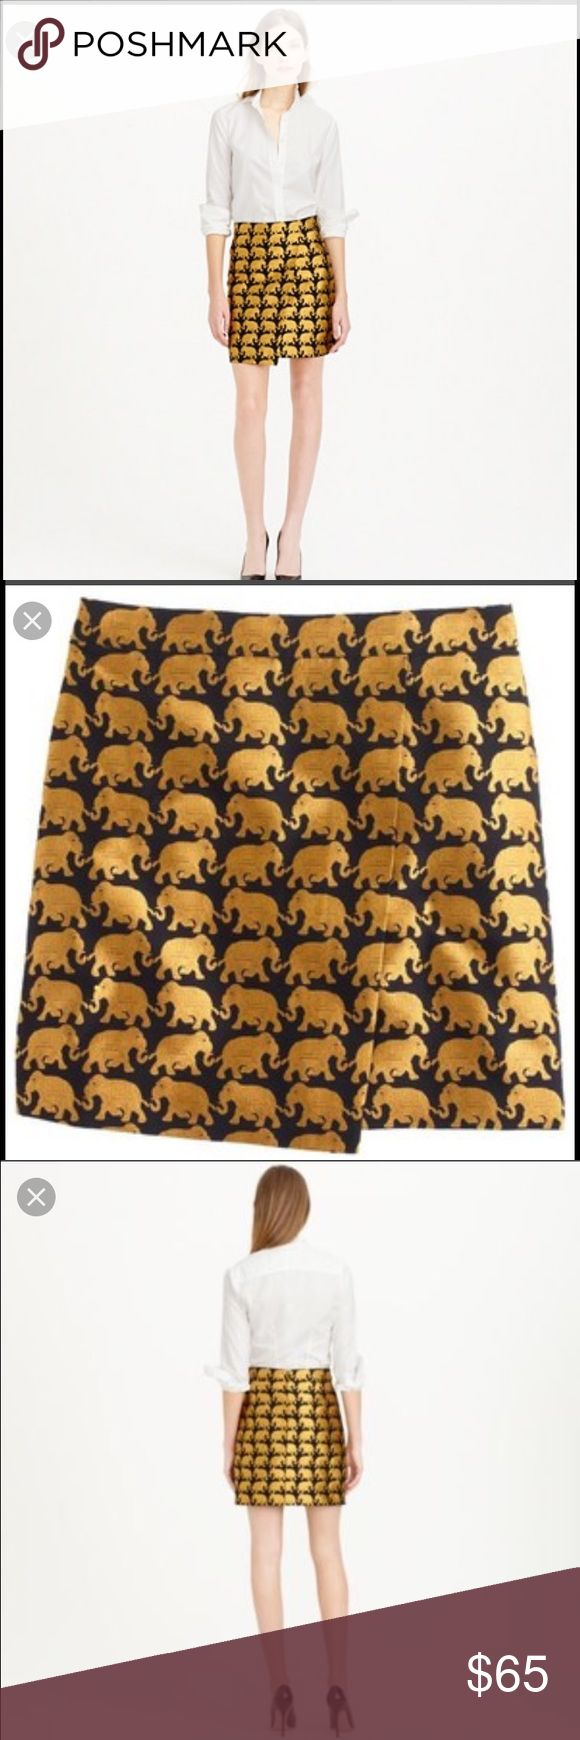 J Crew origami skirt in elephant parade Excellent used condition, j crew origami skirt in elephant parade J. Crew Skirts Mini